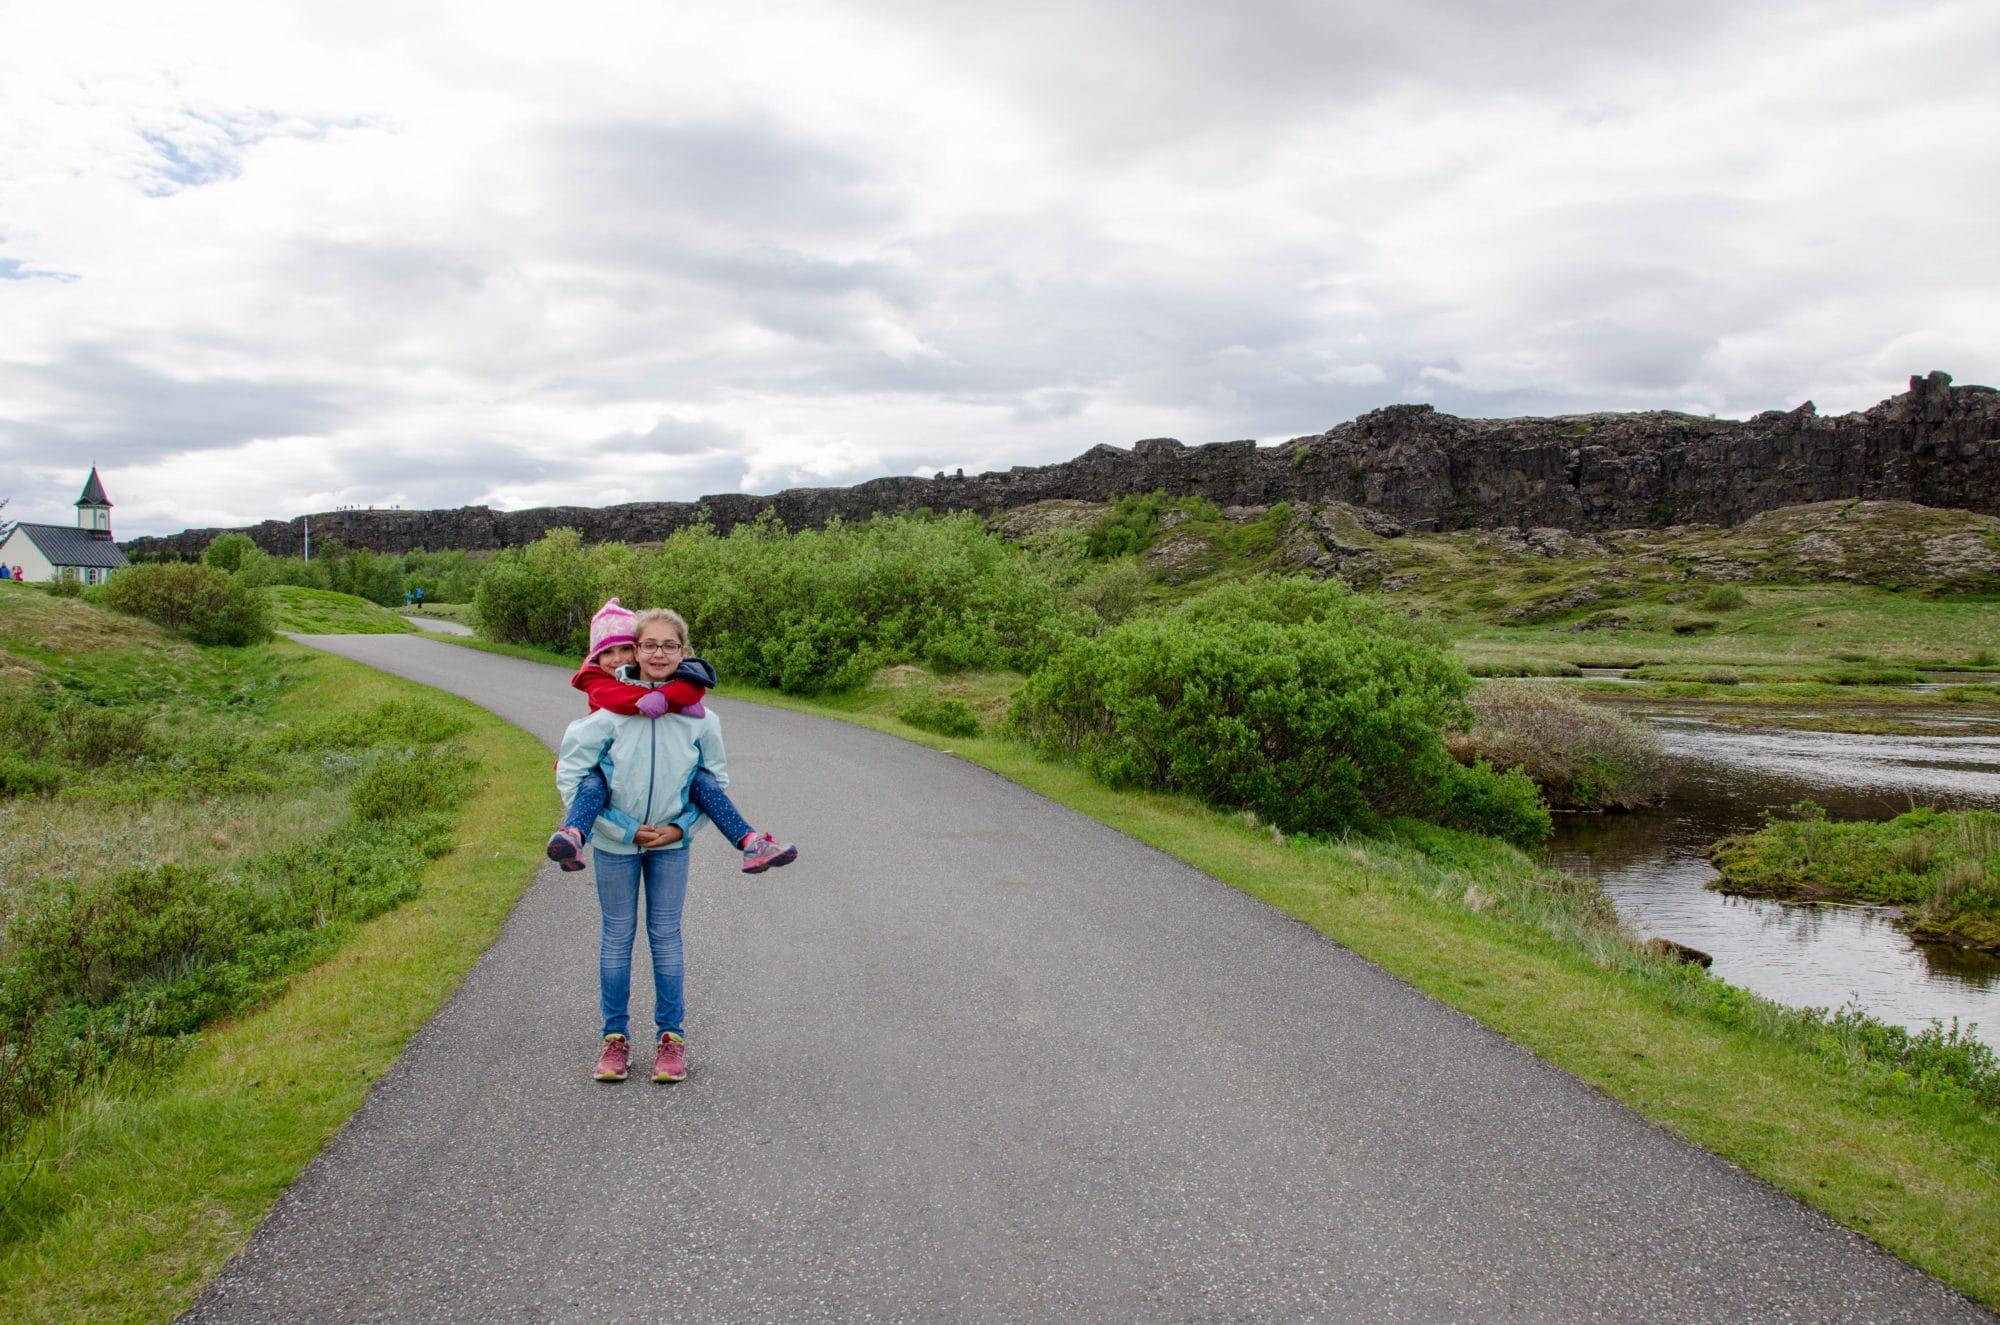 Piggyback at Thingvellir National Park Iceland | Umami Girl